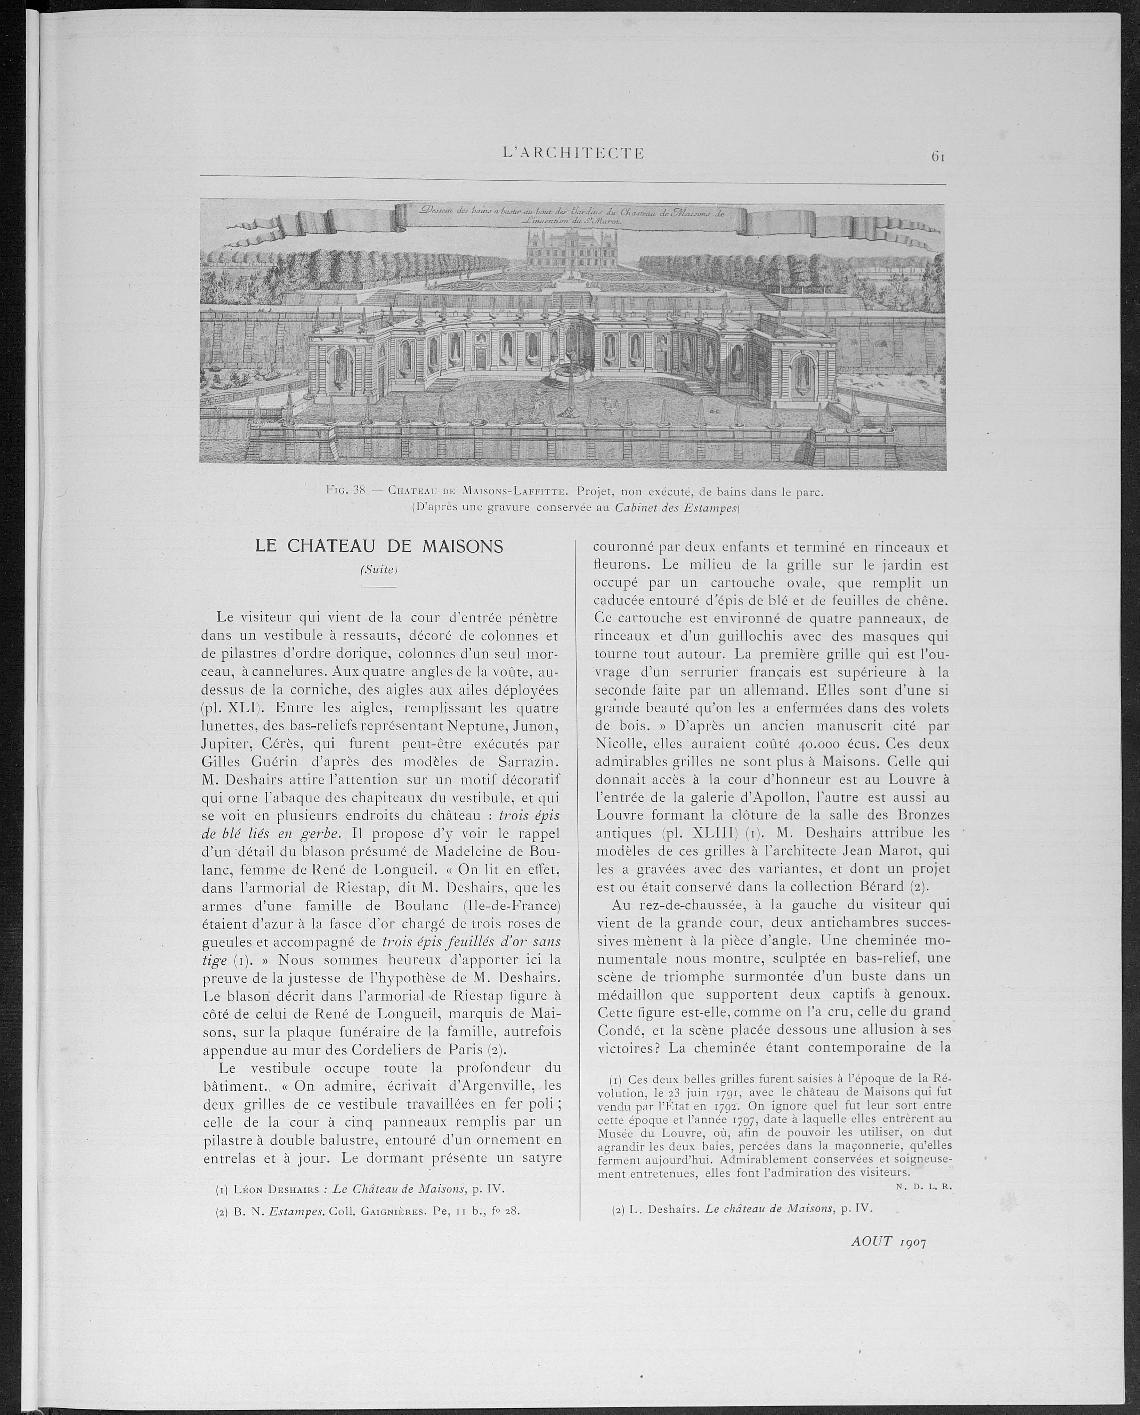 L'Architecte, no. 8, 1907 |